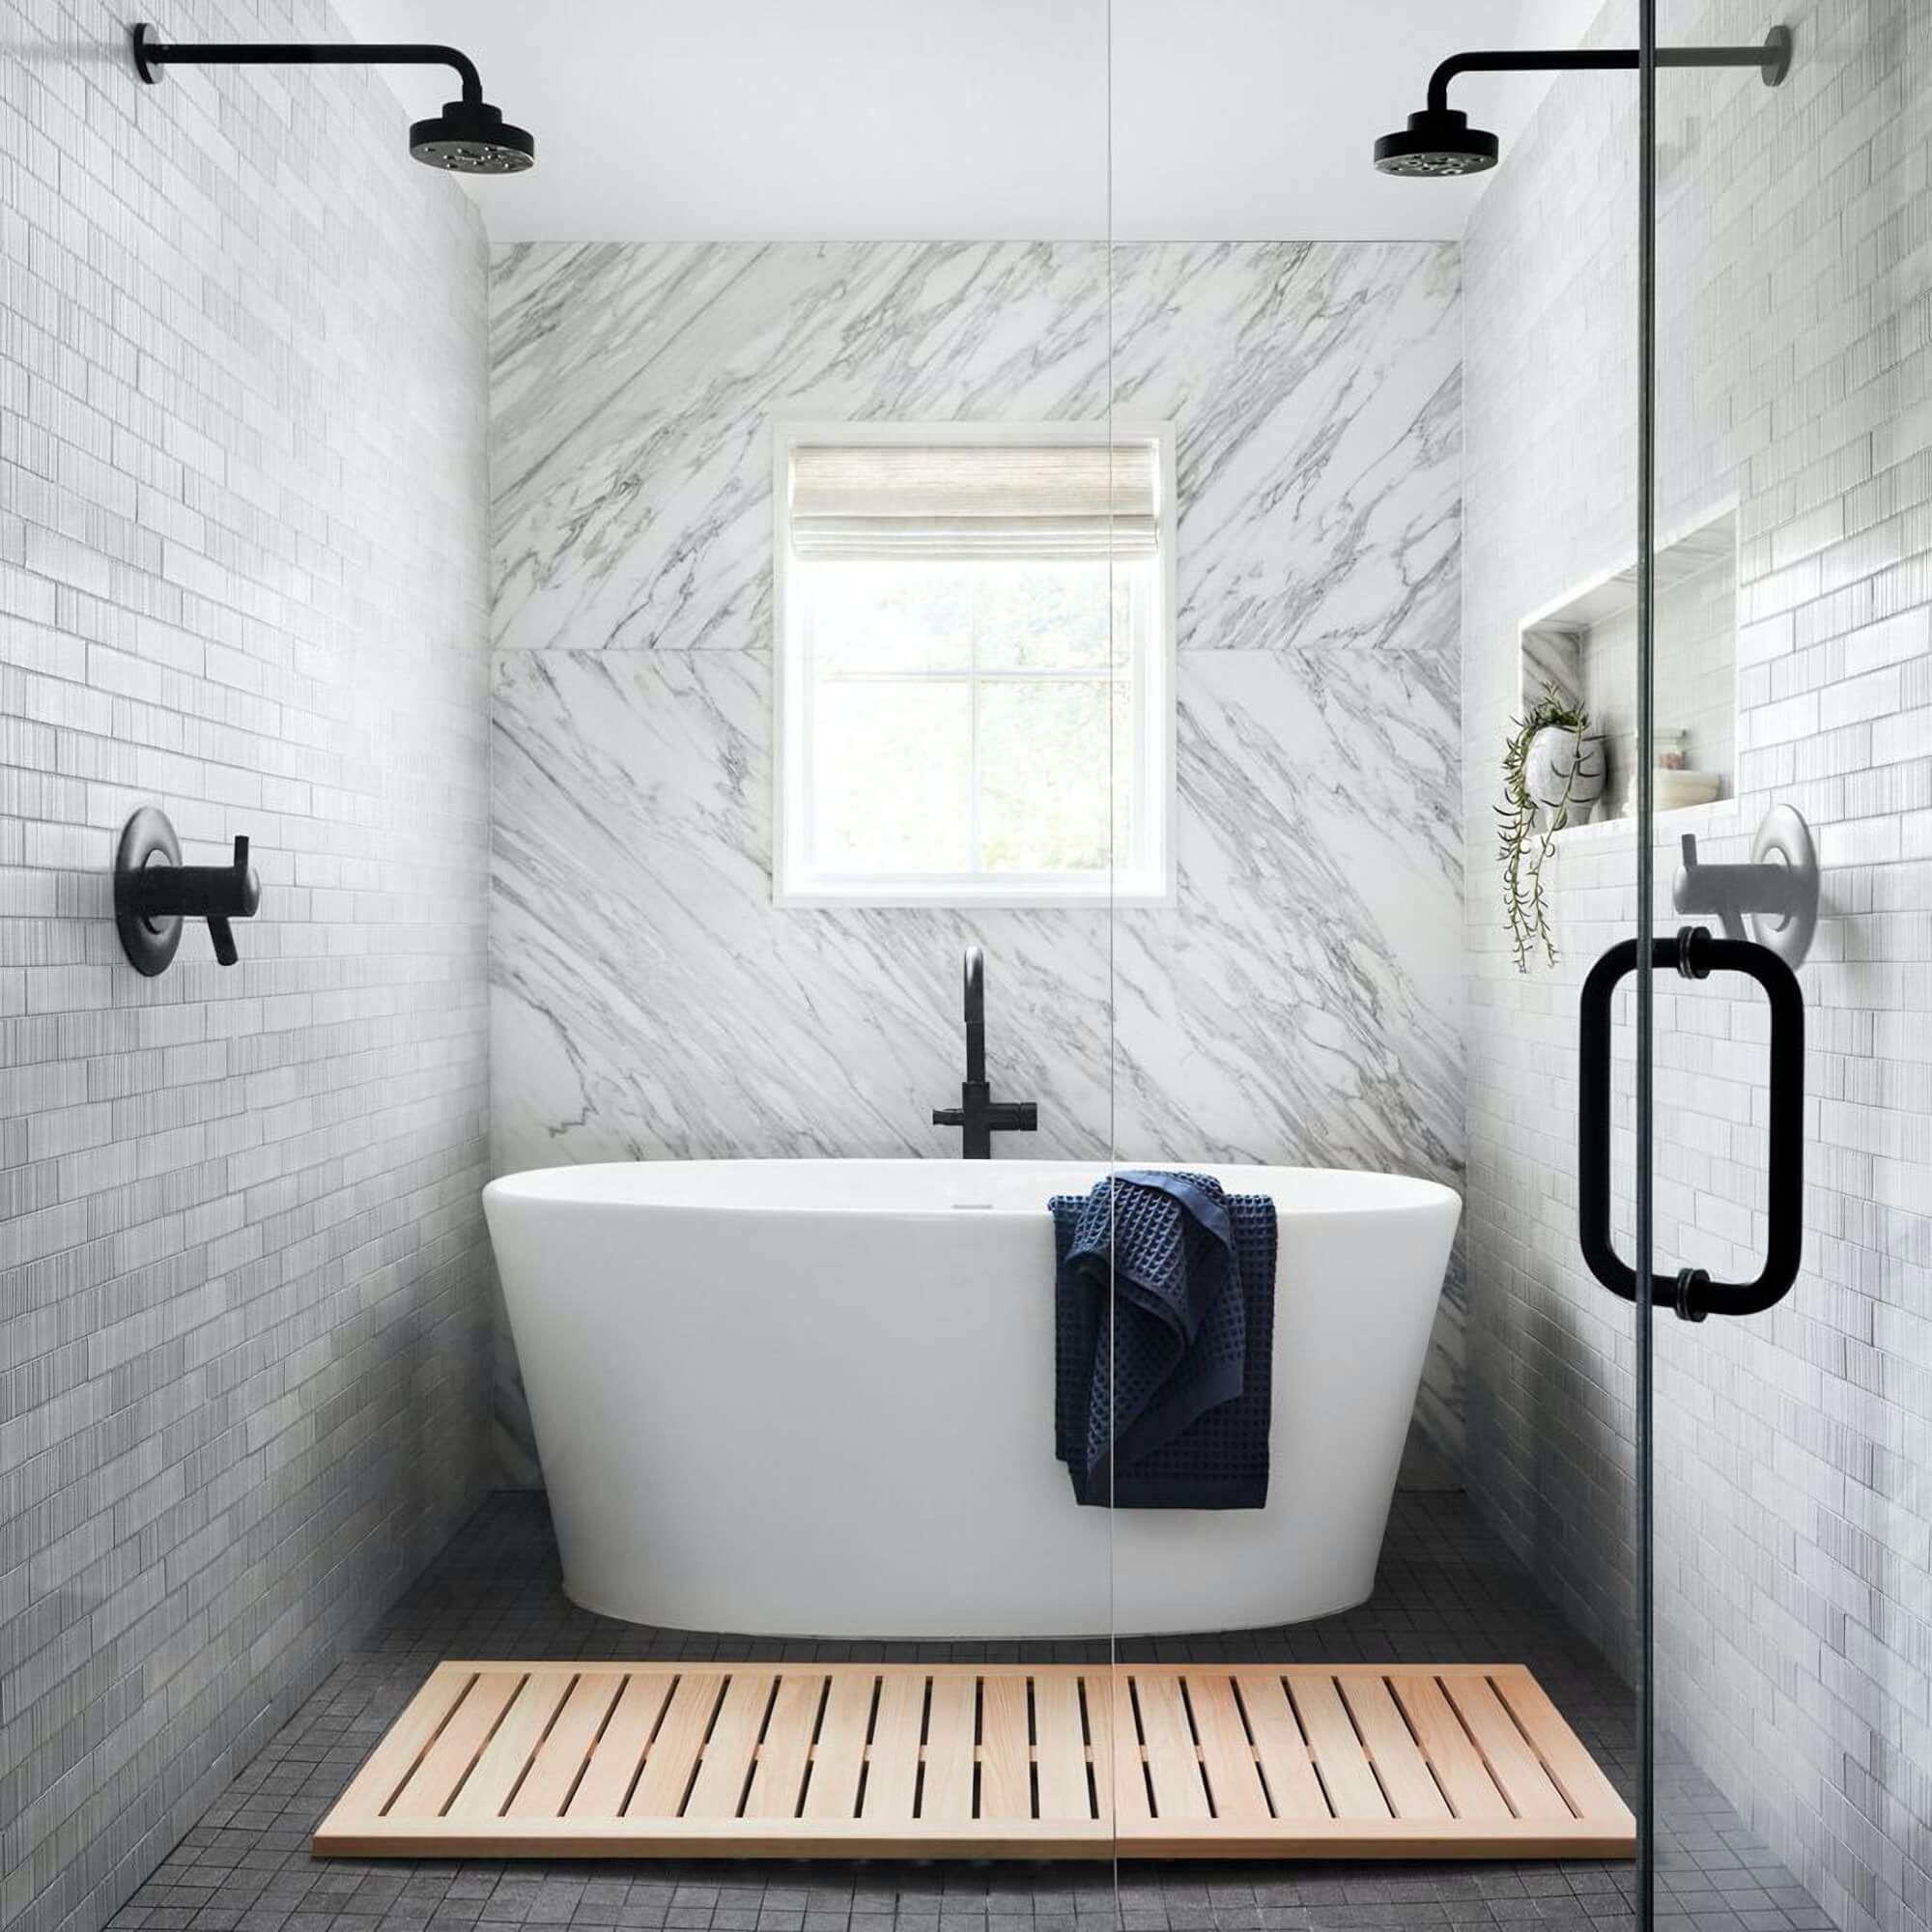 You Want A Wood Bath Mat Bathroom Interior Design Bathroom Interior Bathroom Design